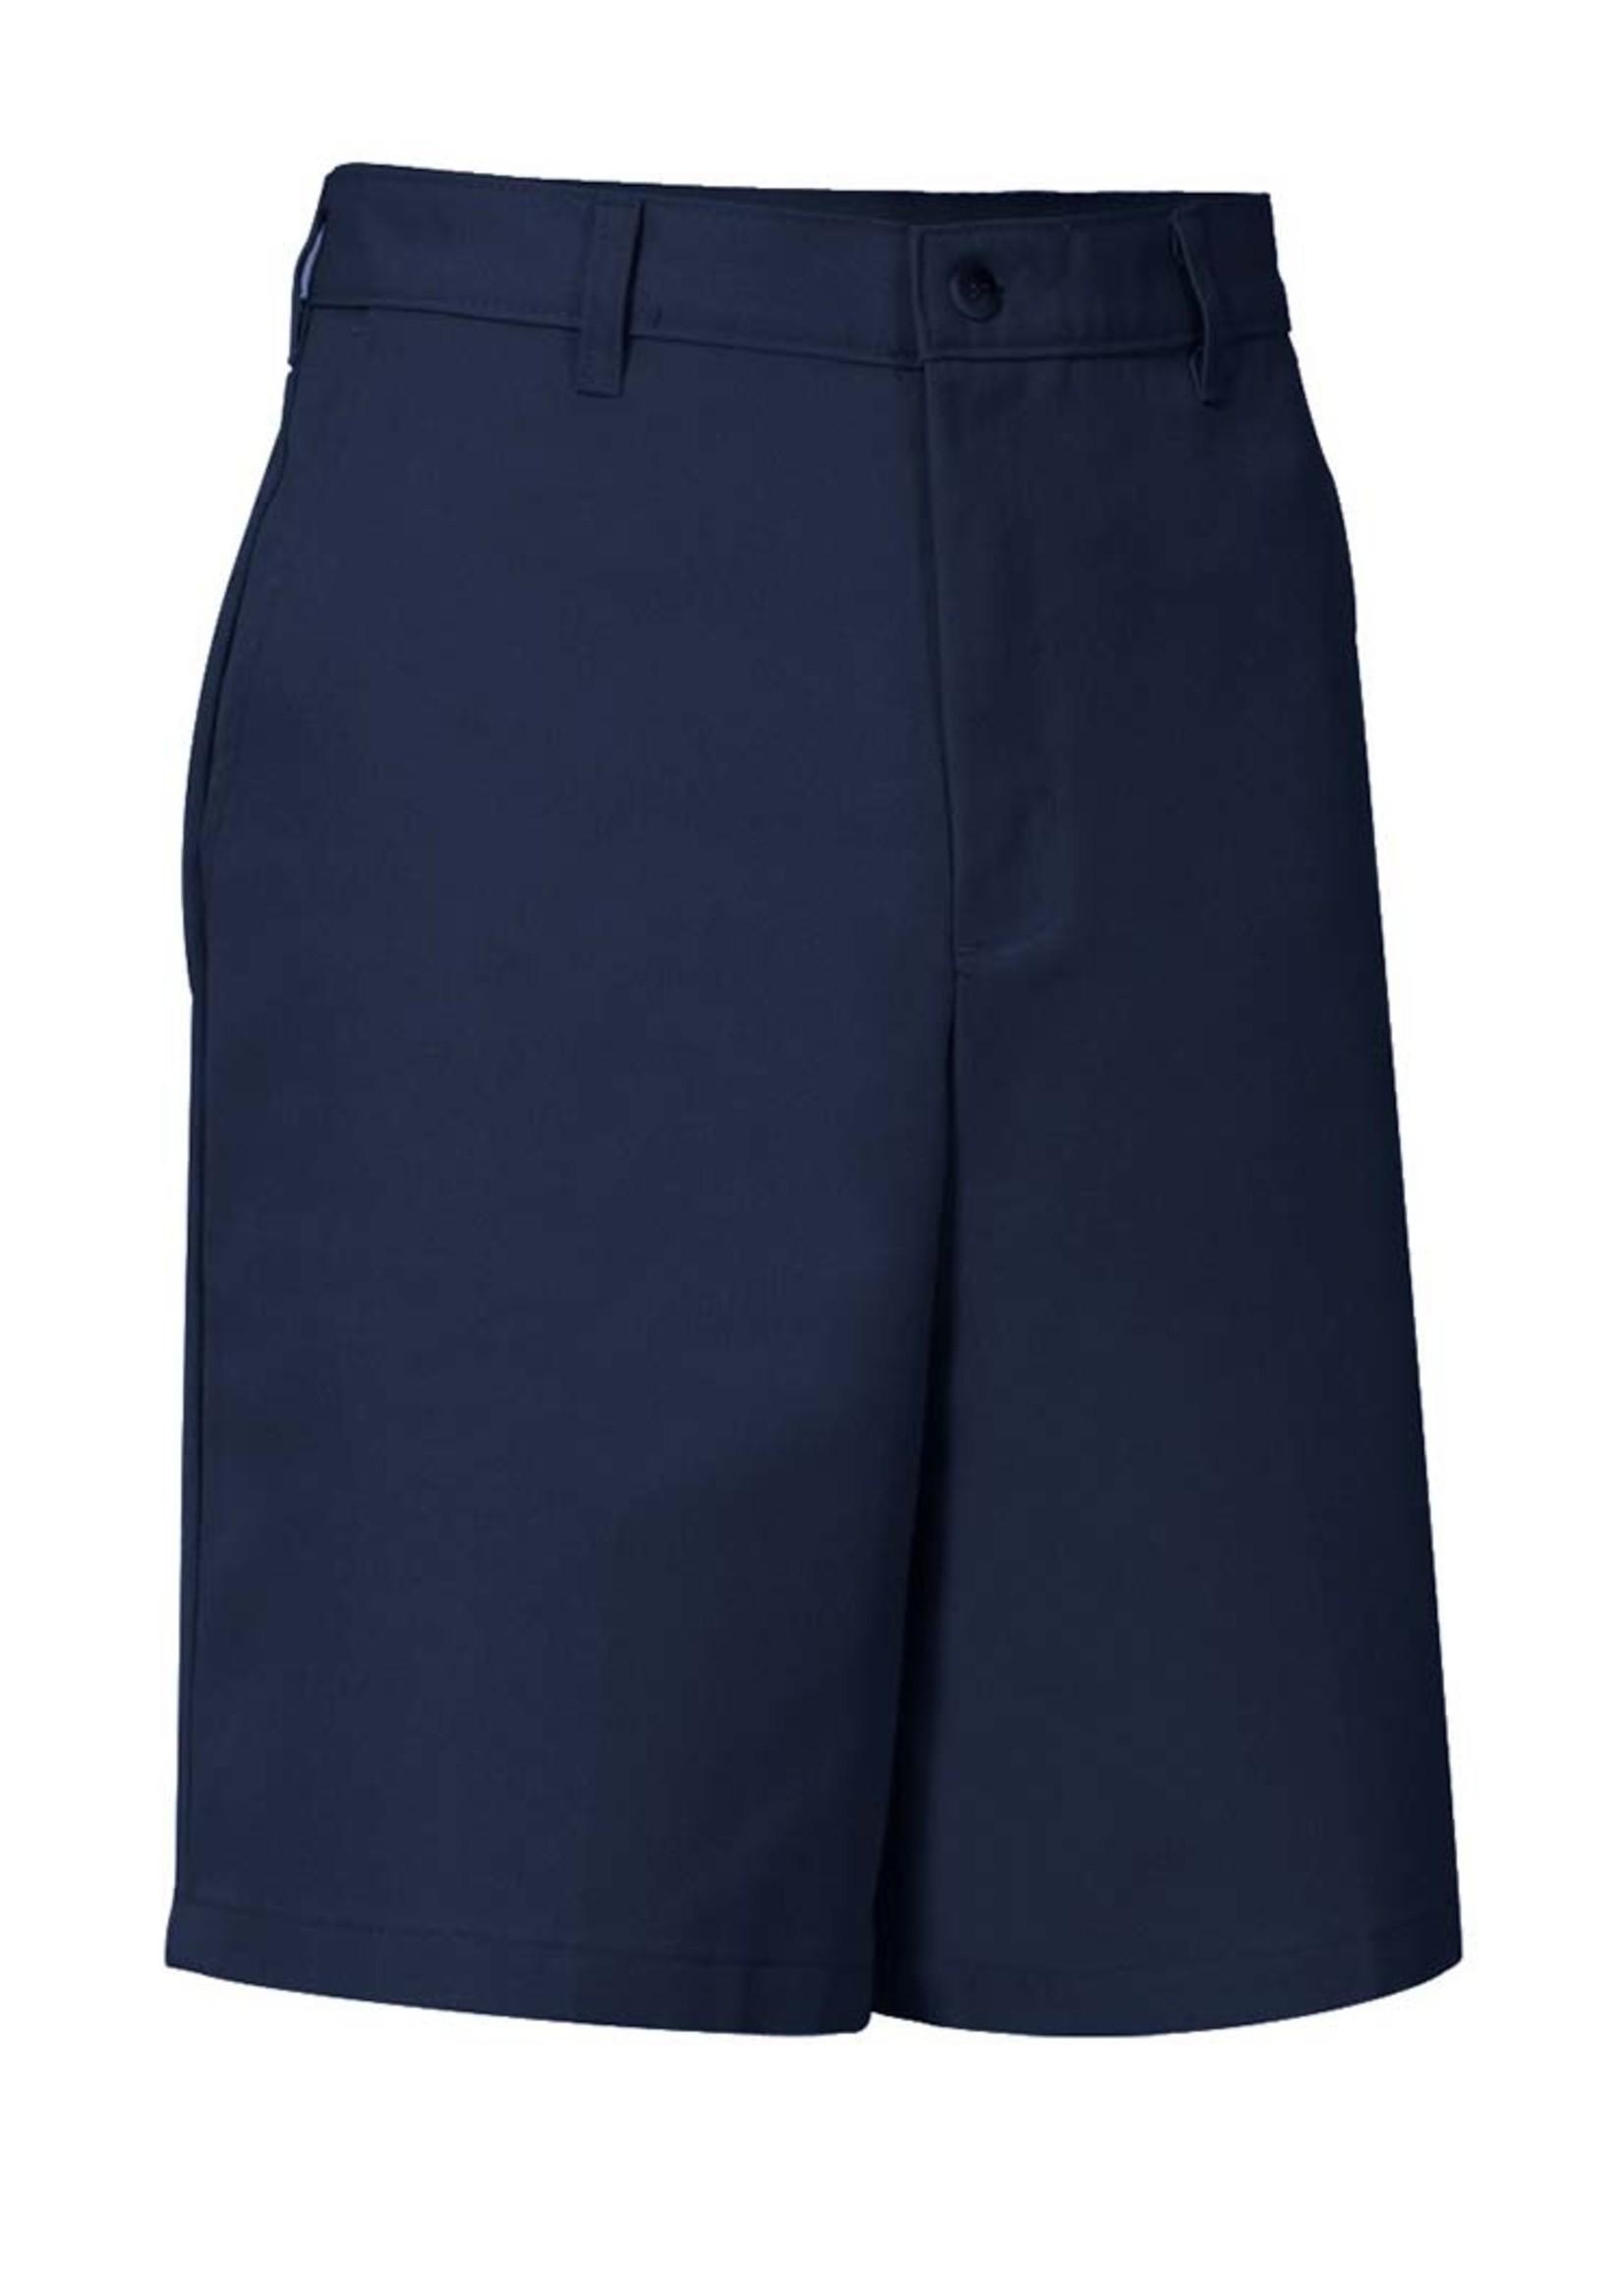 Mens Navy Flat Front Shorts with logo